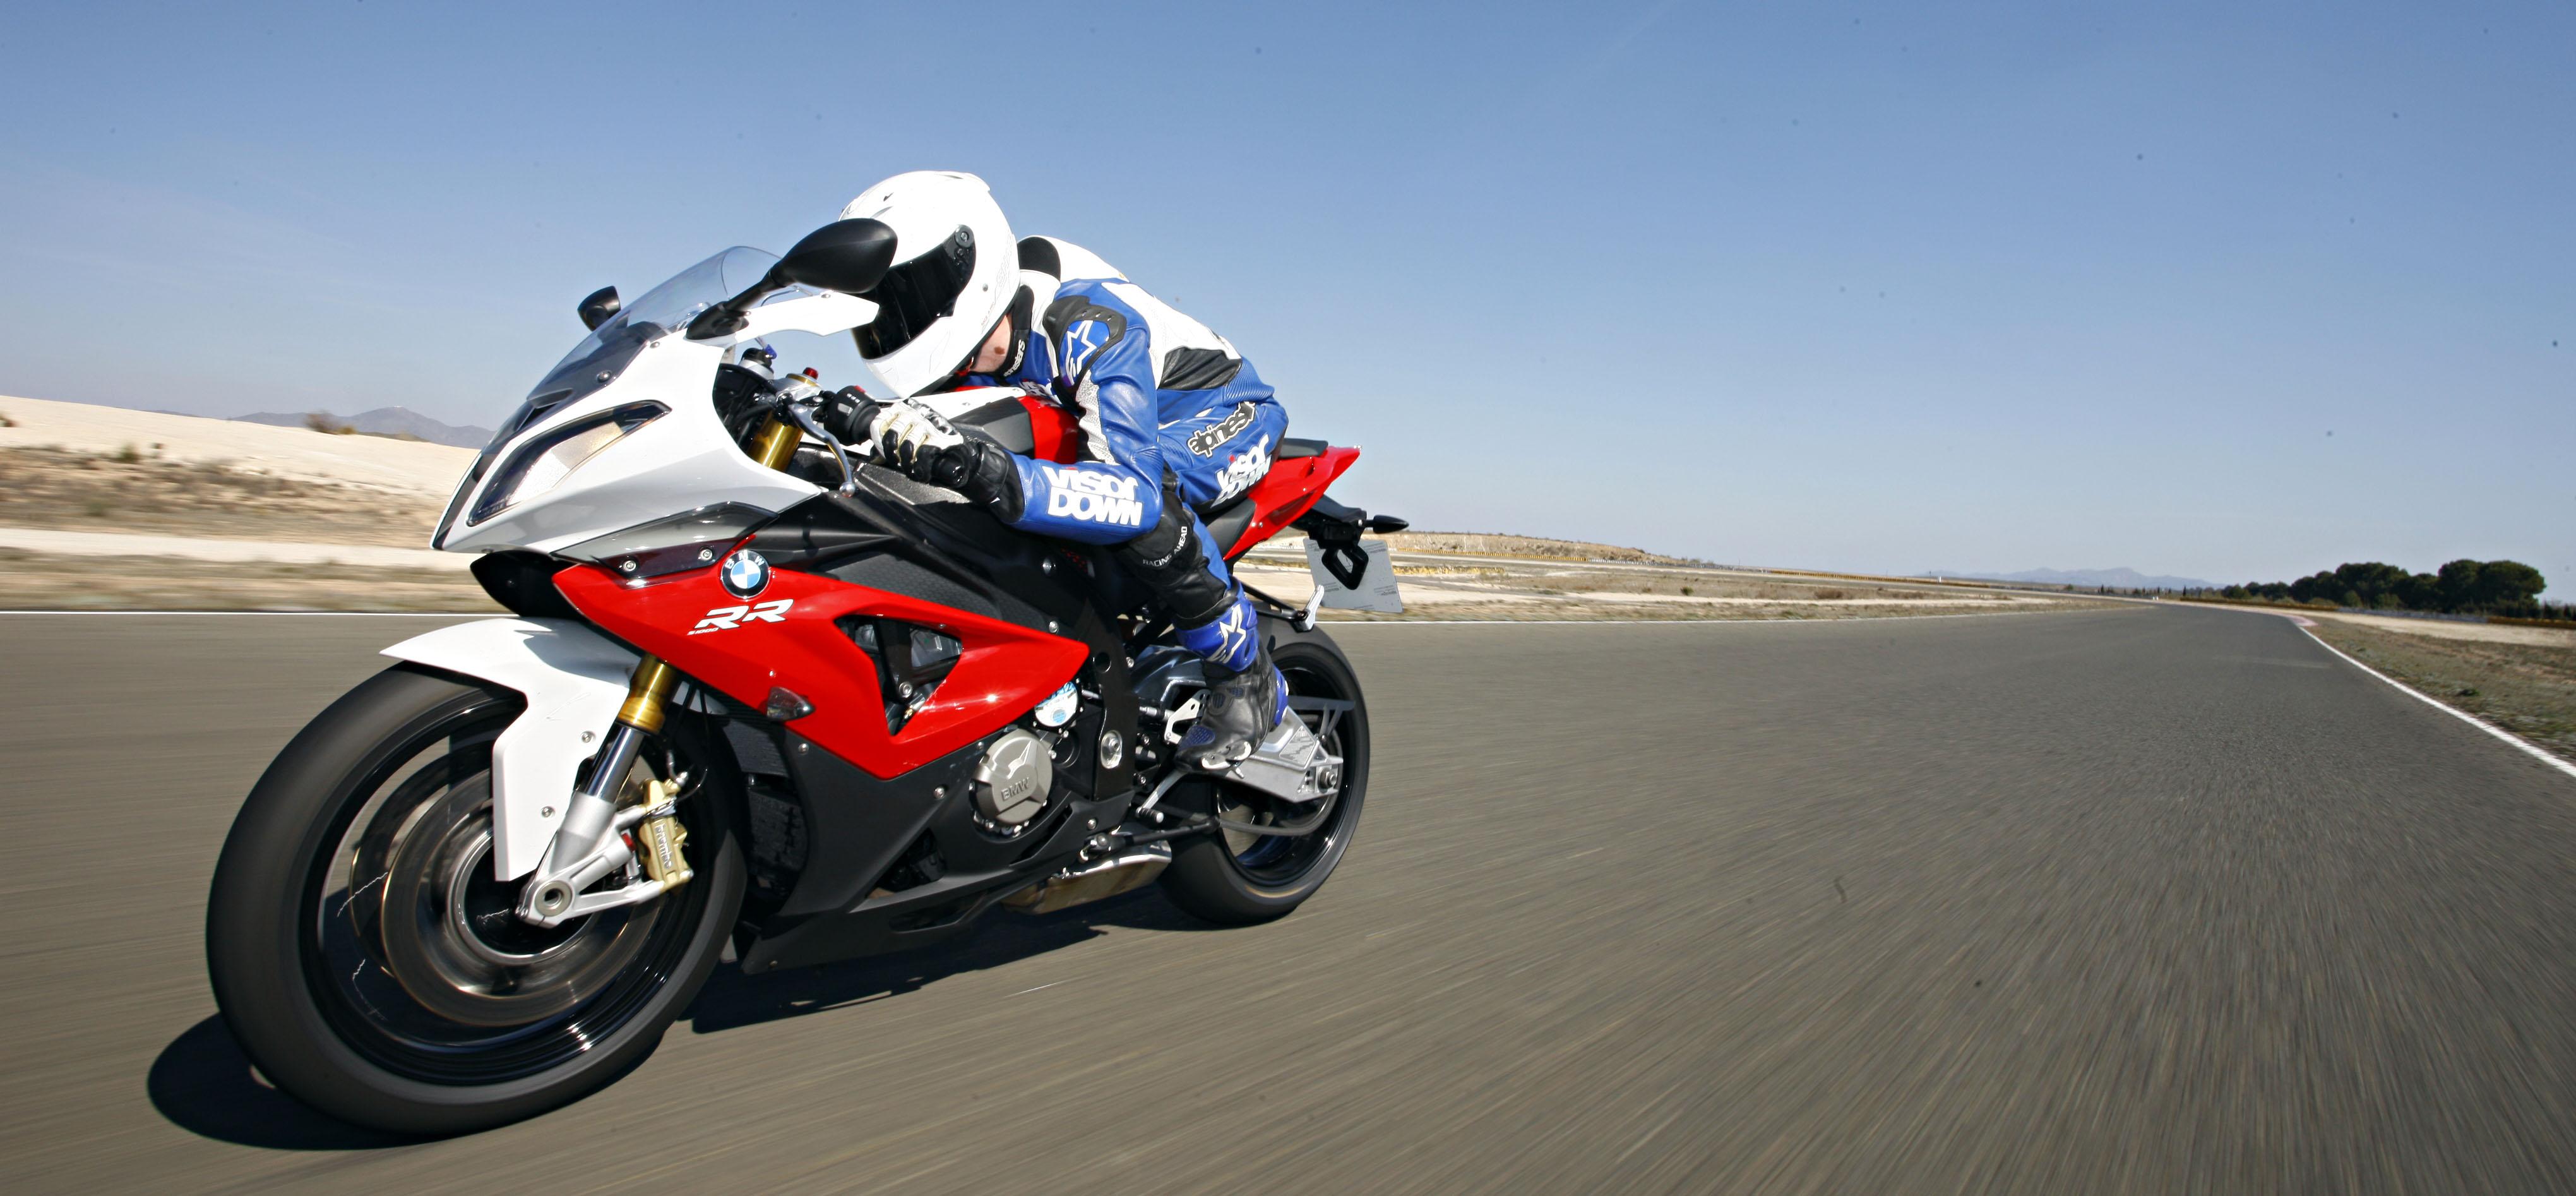 Bmw S1000rr For Sale >> 2011 BMW S1000RR vs. 2012 S1000RR track ... | Visordown